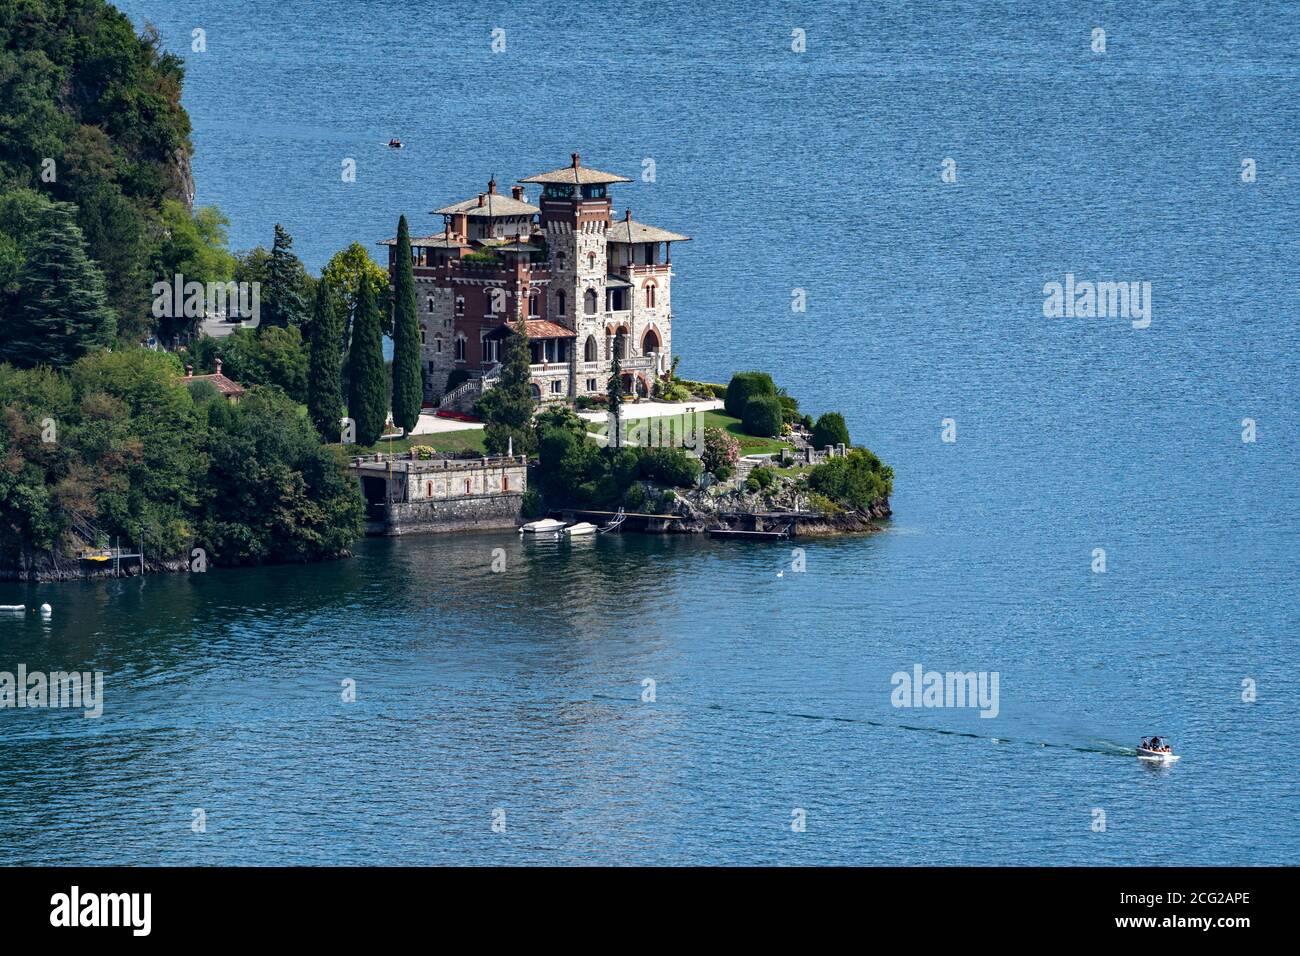 Italy. Lombardy. Lake Como. Around the village of Menaggio. Villa on the lake Stock Photo